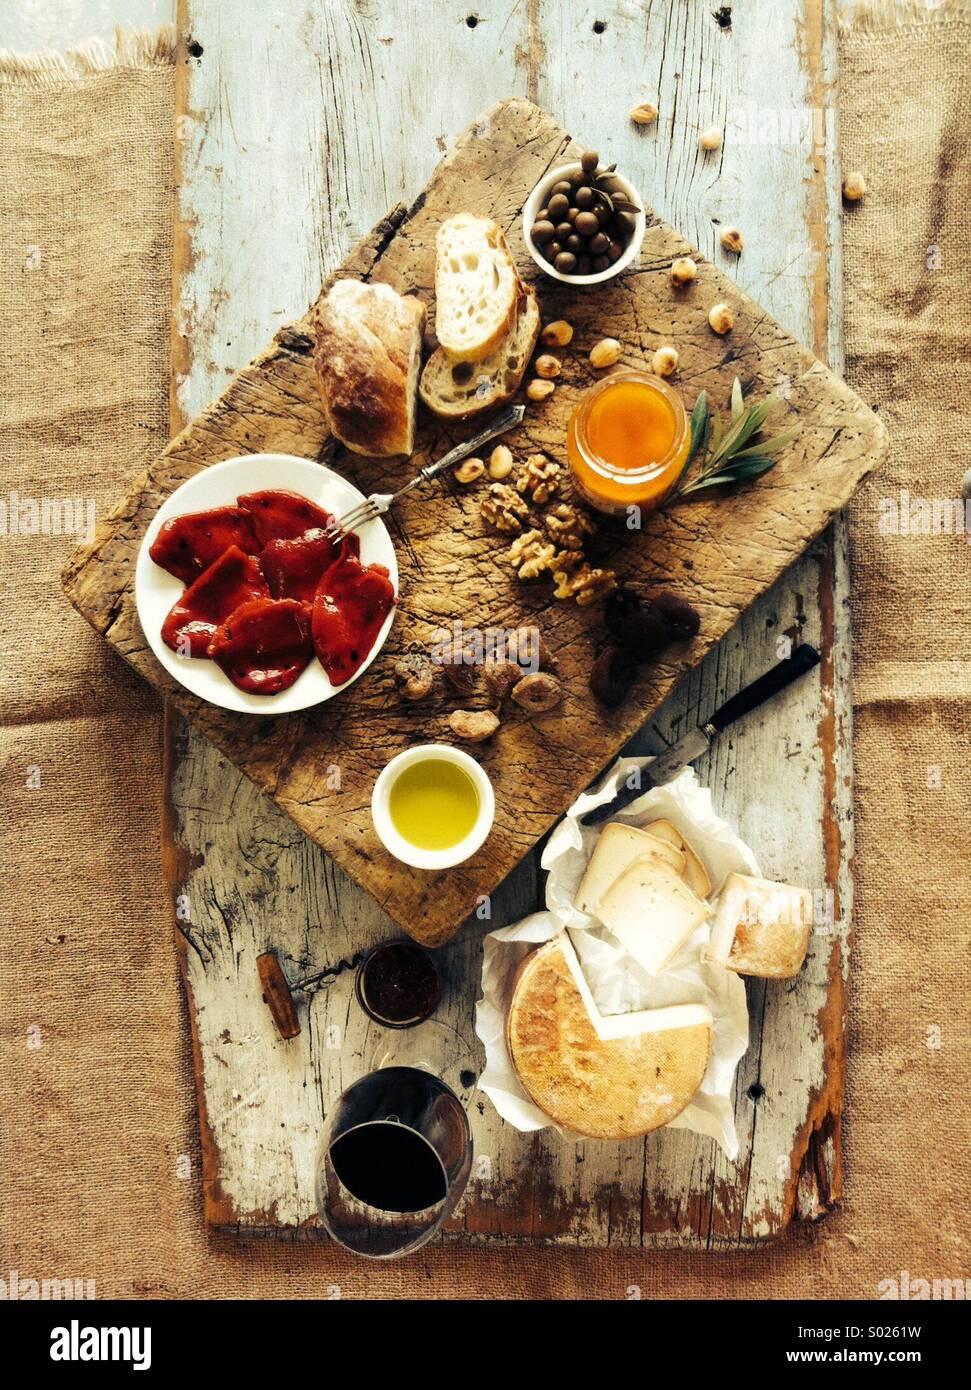 Lussureggiante di cucina spagnola Immagini Stock